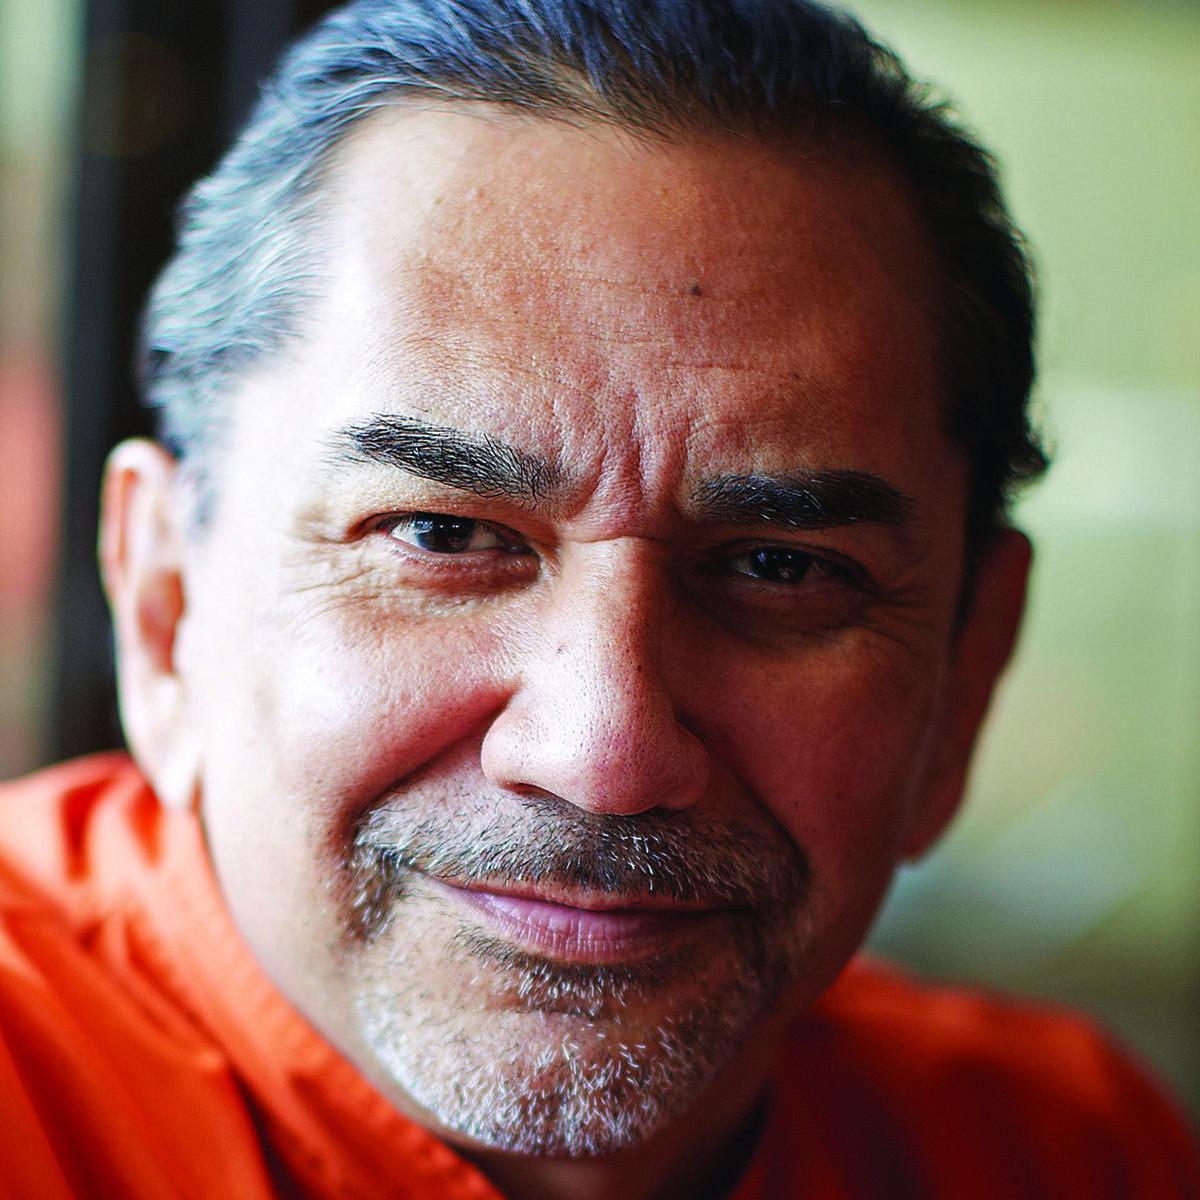 Dallas restaurateur Mico Rodriguez